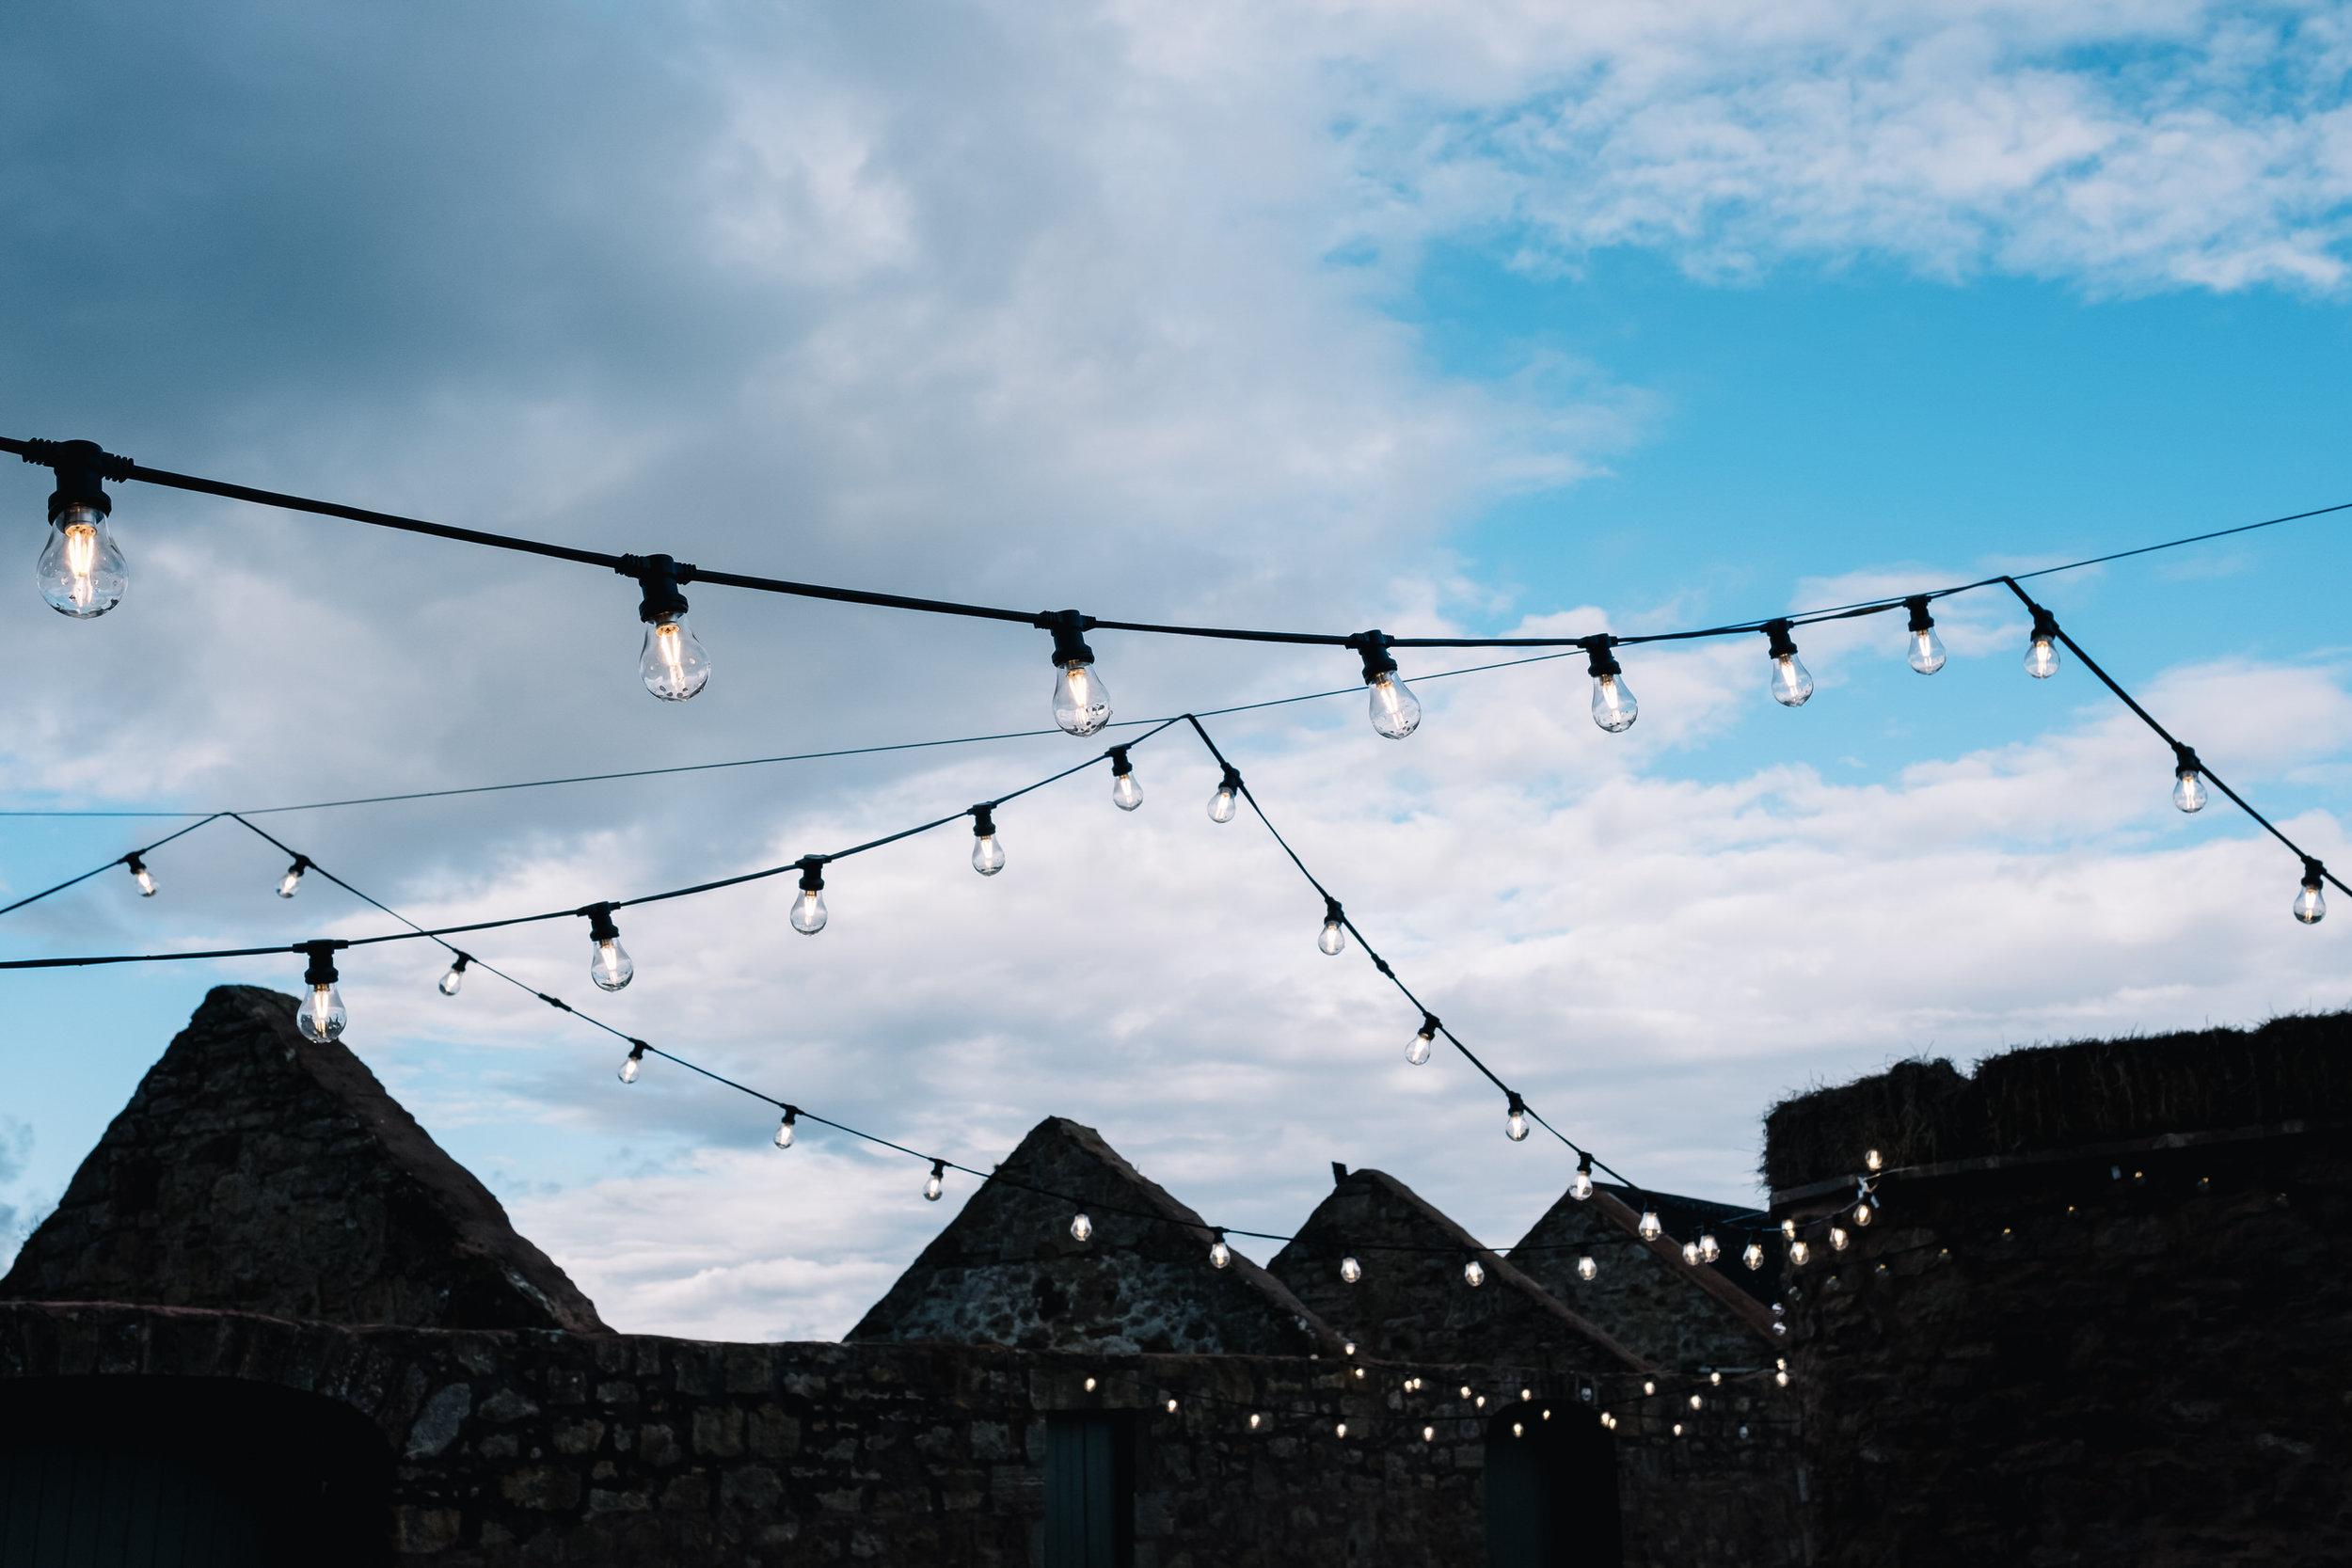 010-wedding-lighting-scotland.JPG